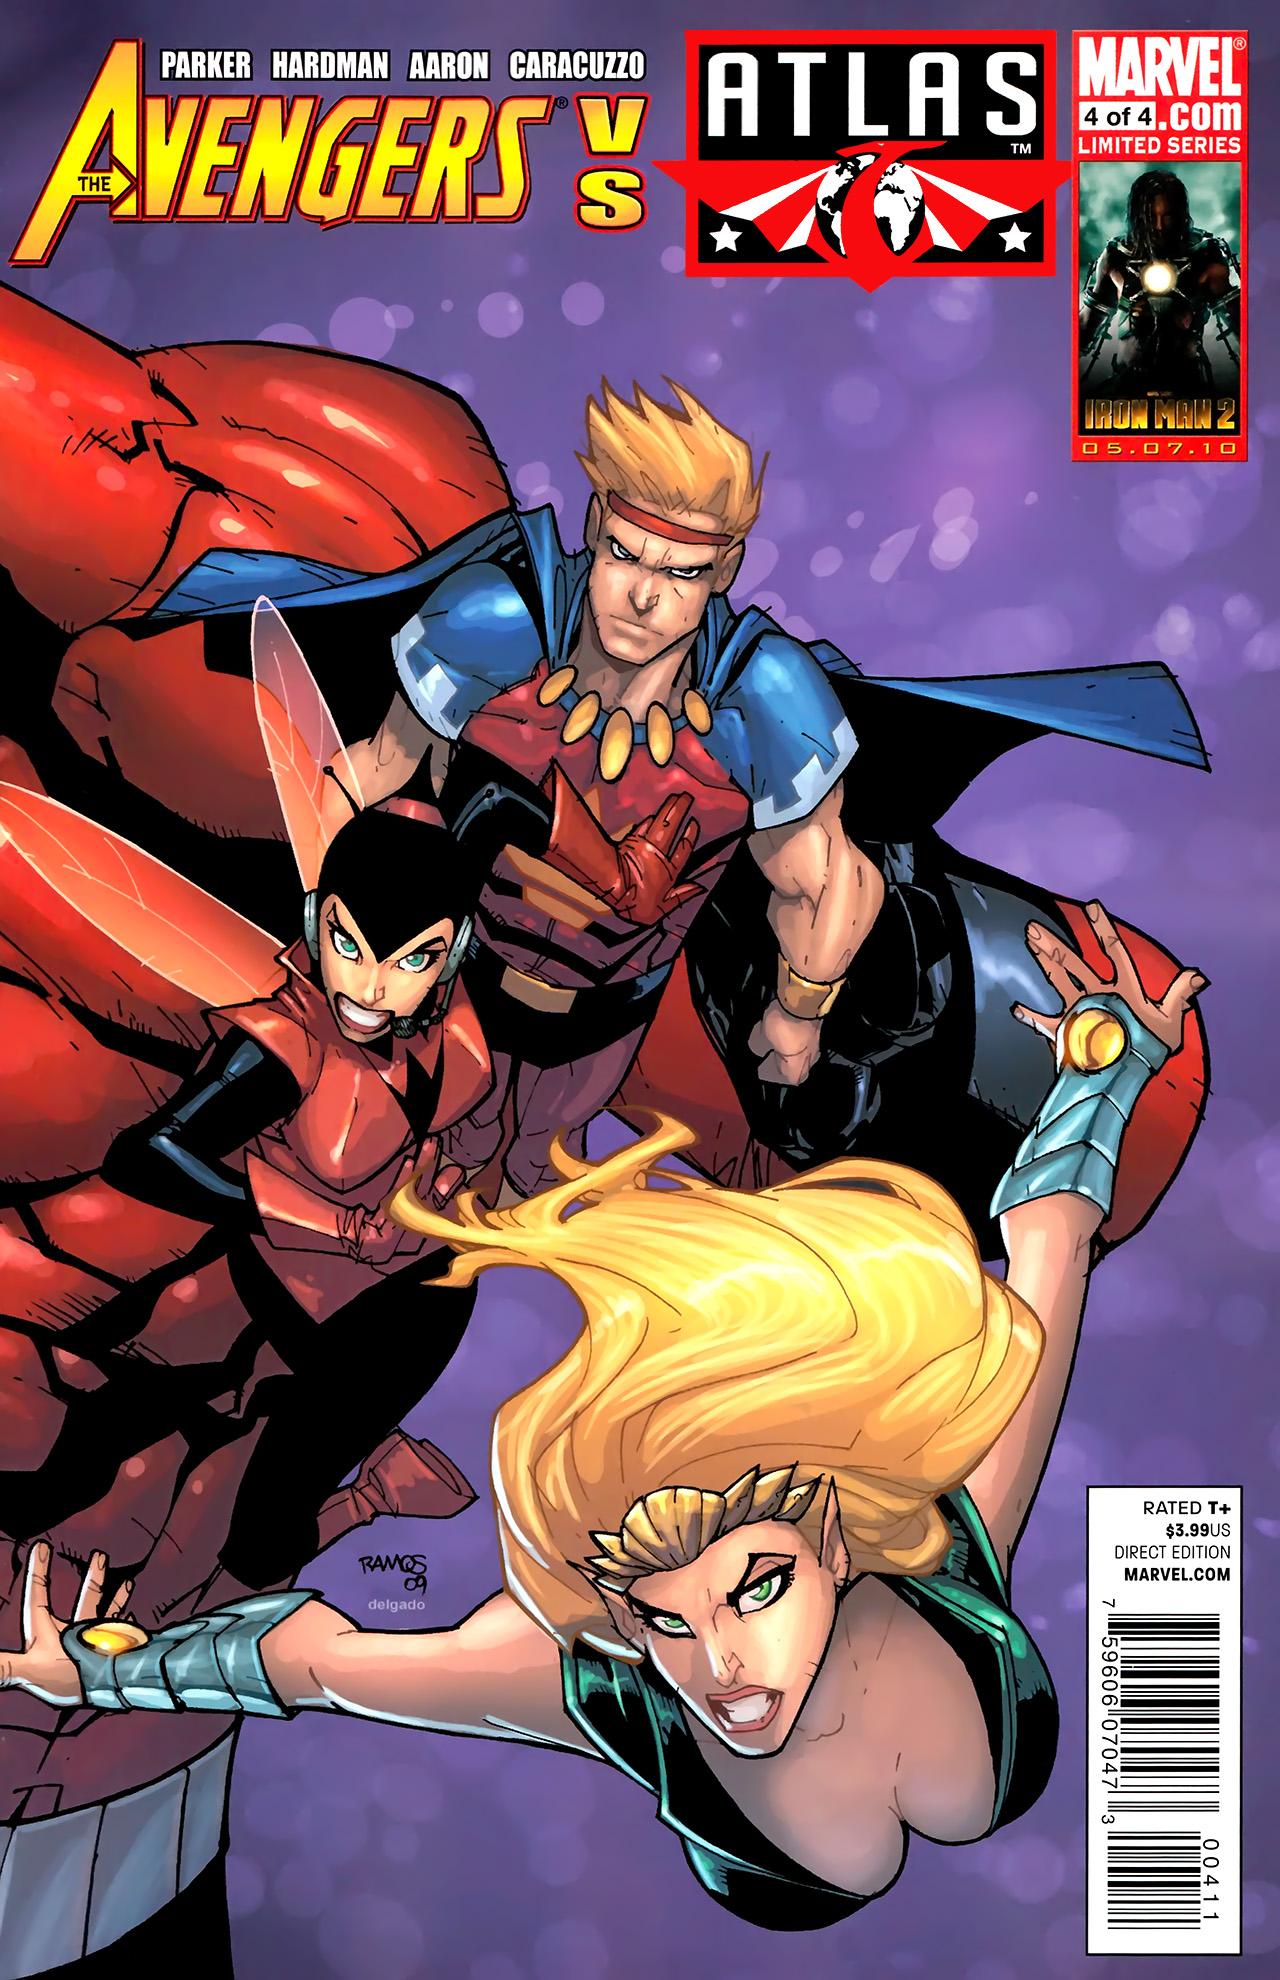 Avengers vs. Atlas 4 Page 1